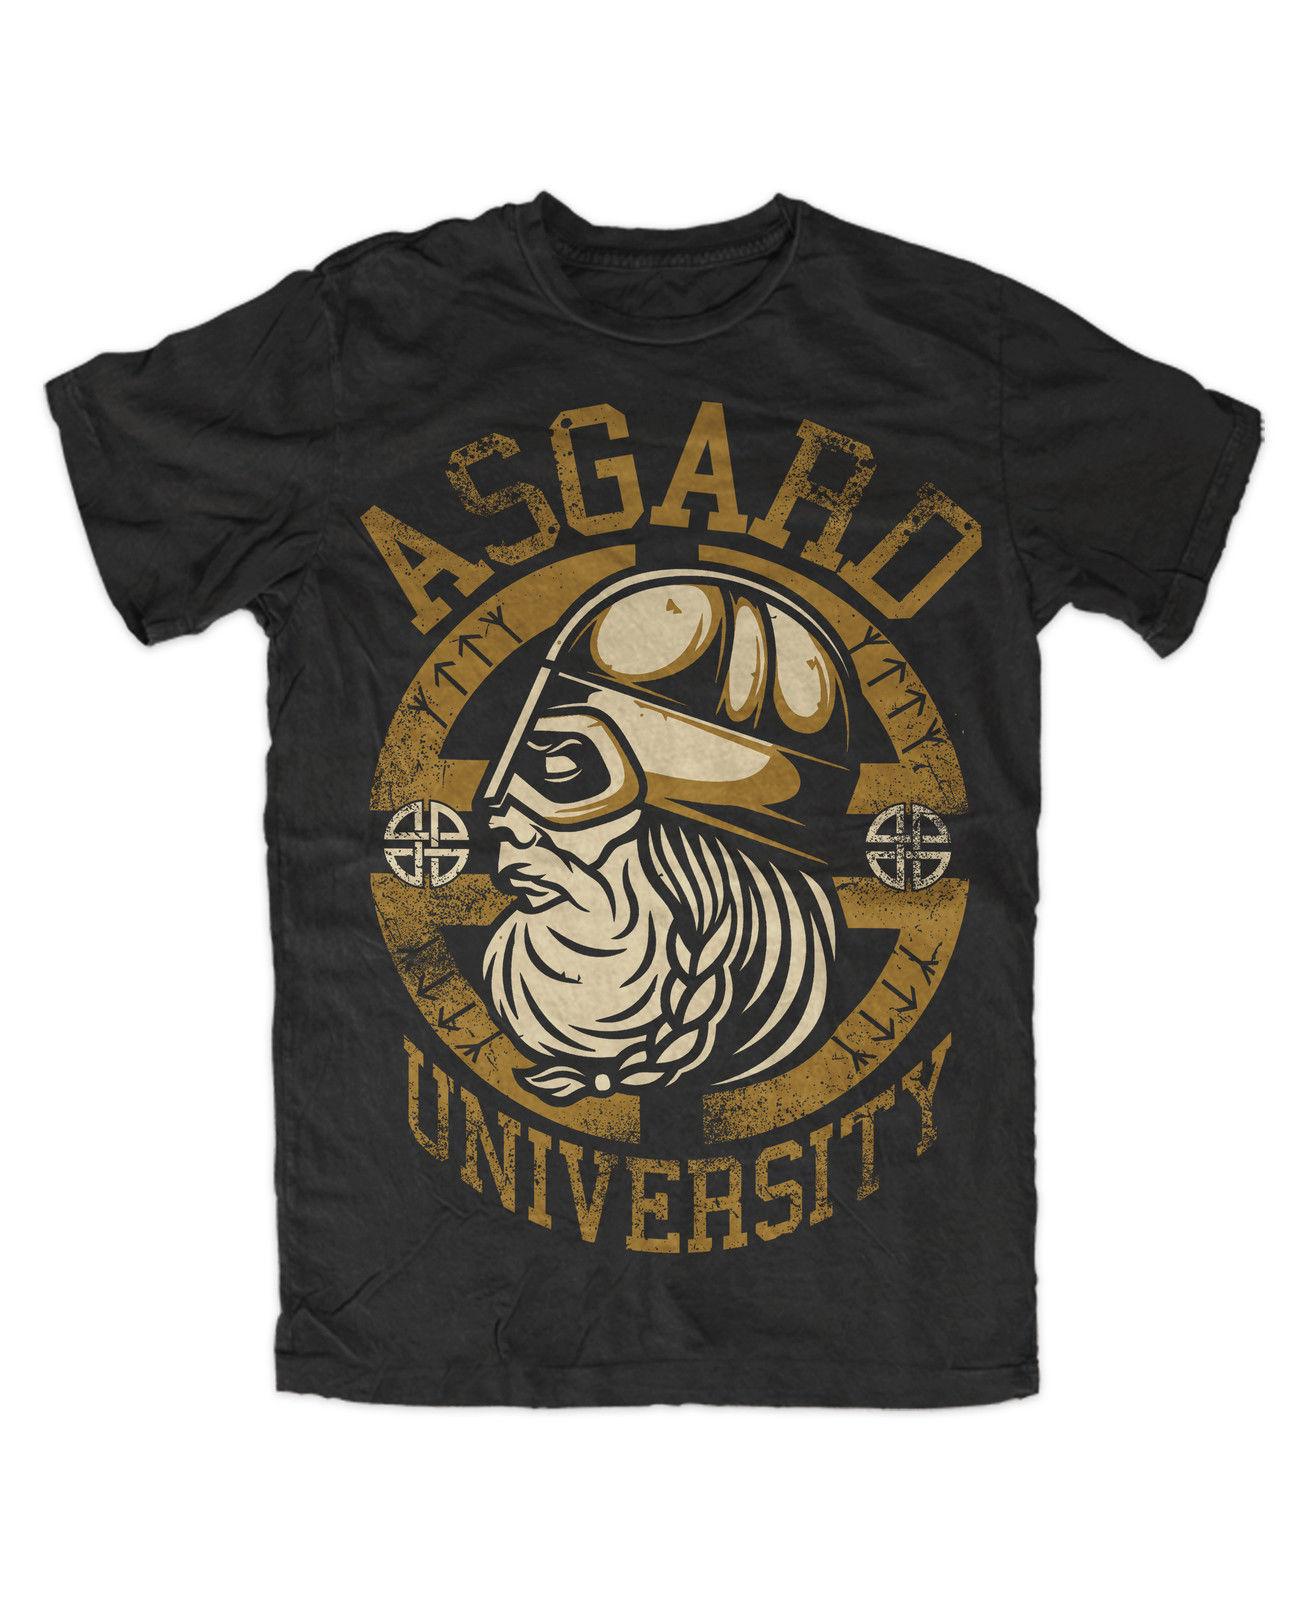 Asgard Universidad camiseta vikingo Odin Germanen... Wikinger oferta barata de algodón 100% T camisas para niños de dibujos animados